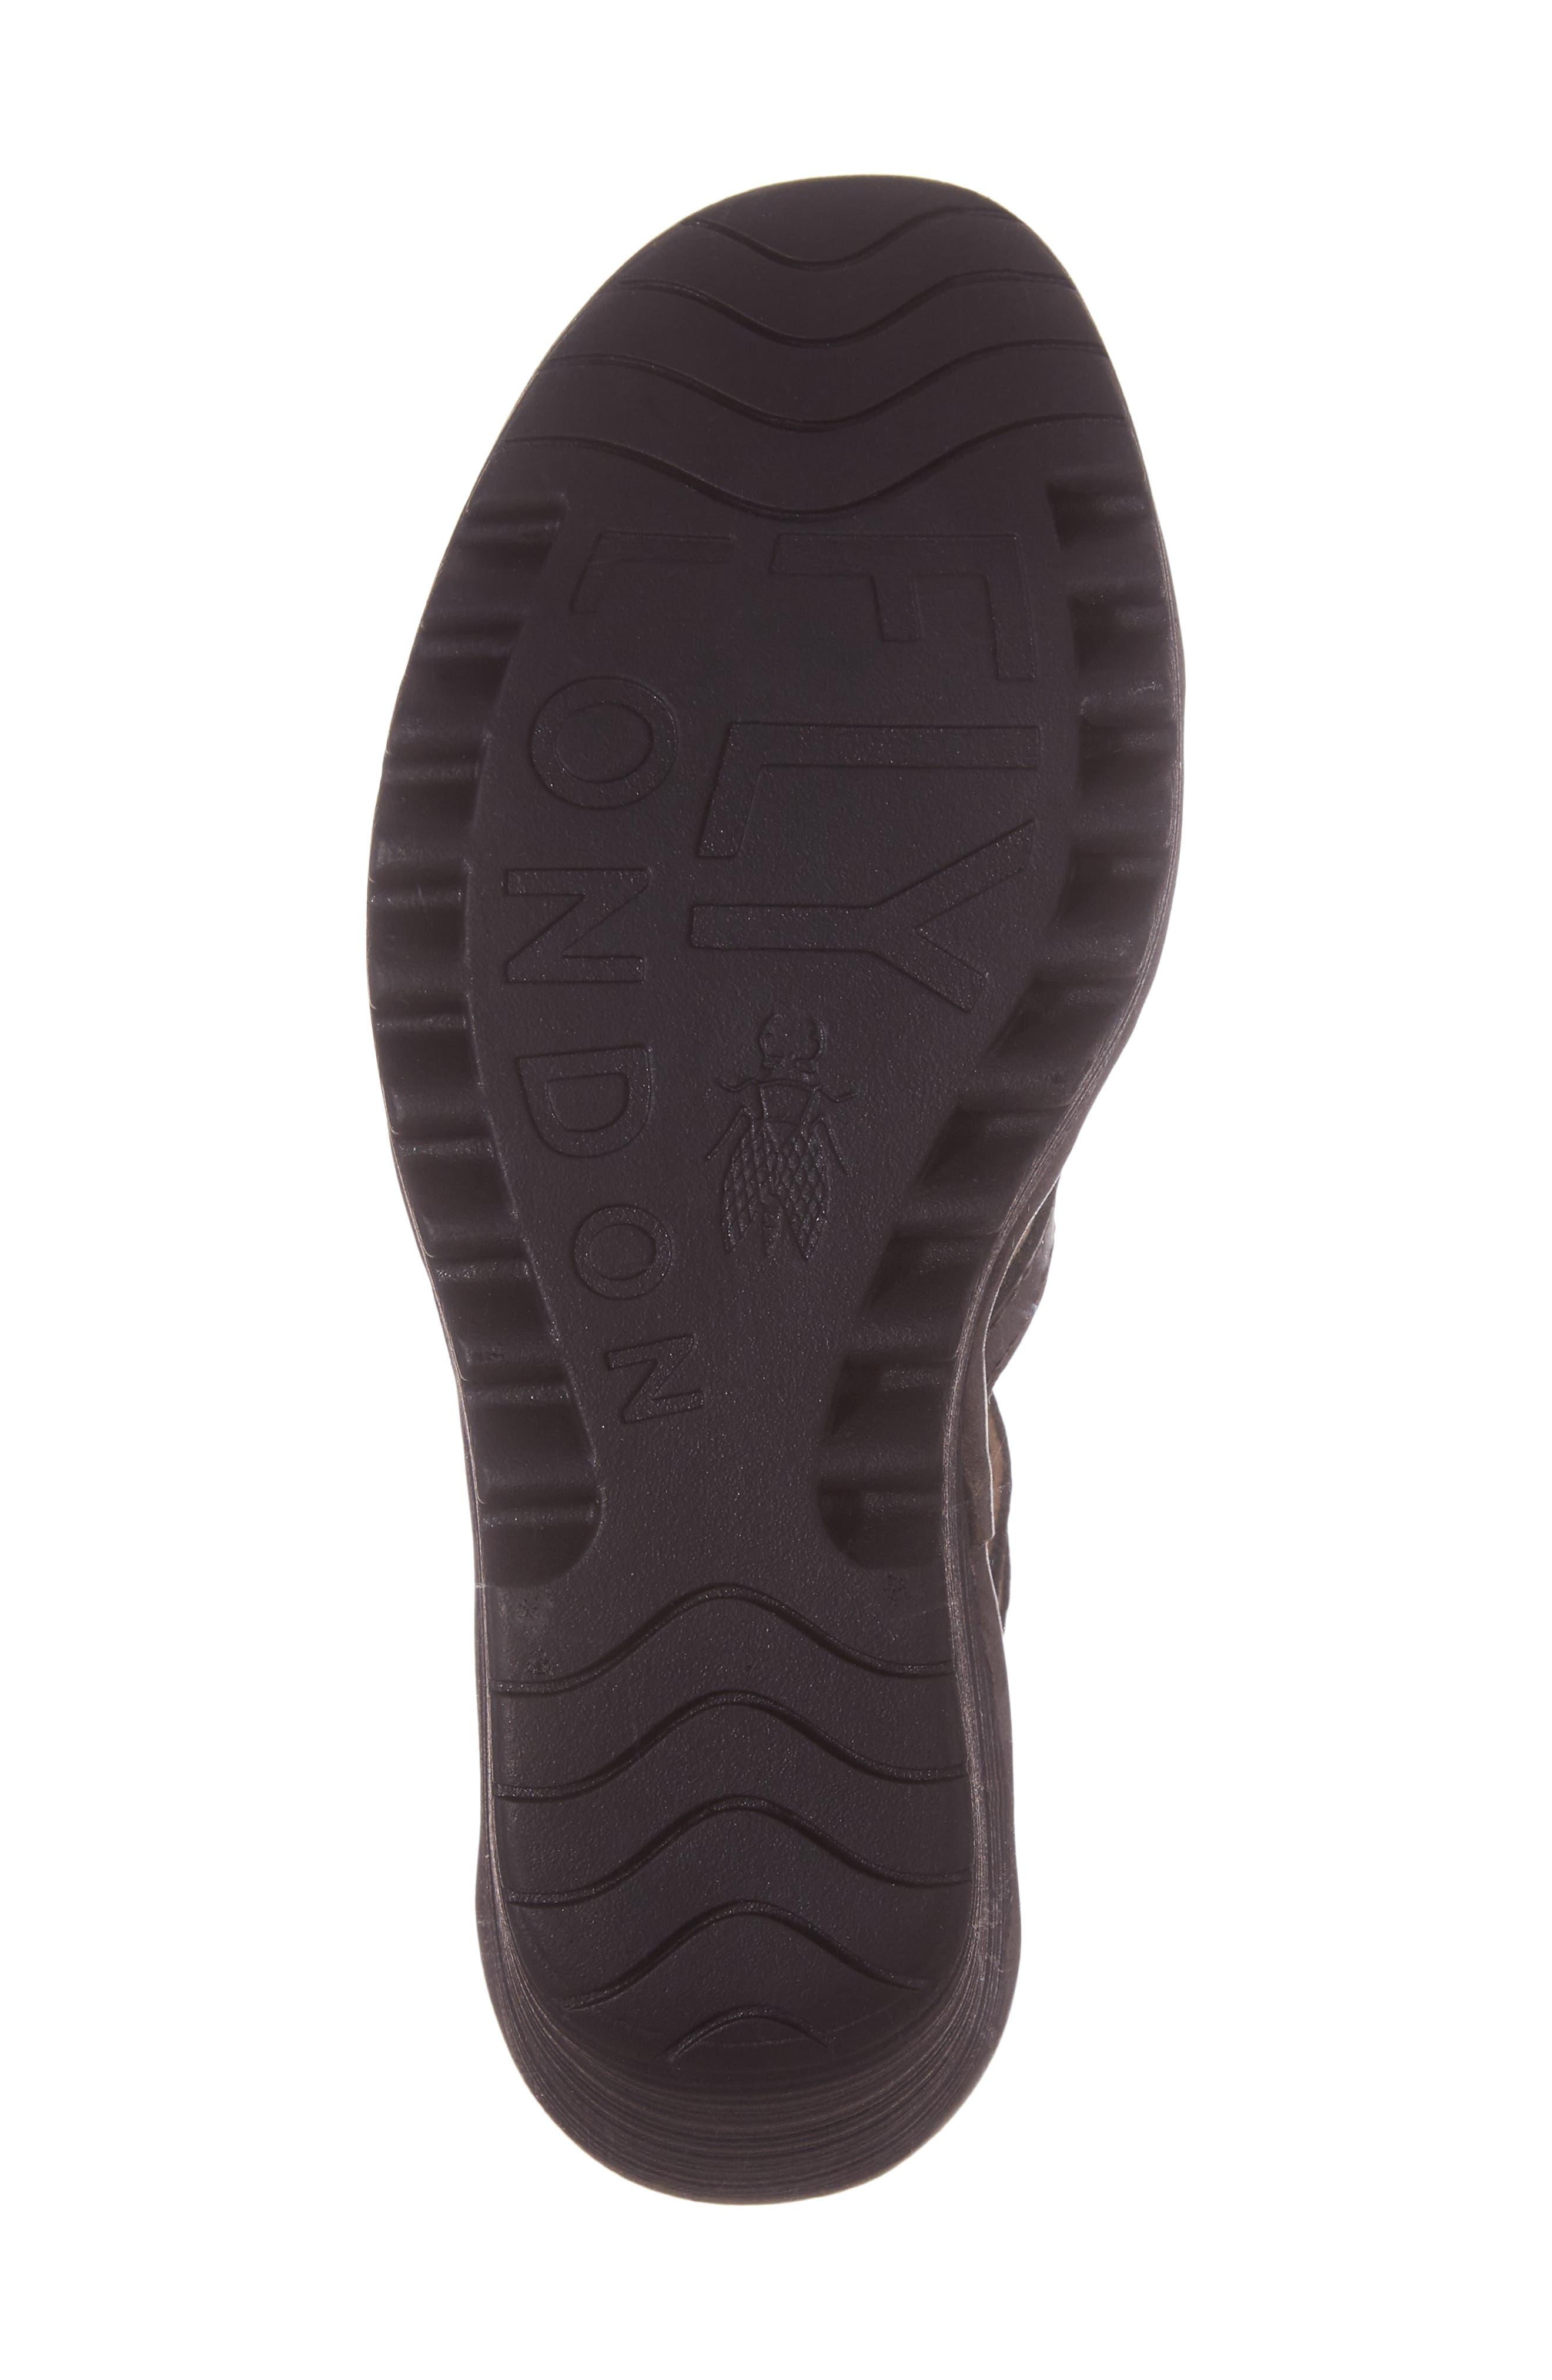 'Yuke' Platform Wedge Sandal,                             Alternate thumbnail 6, color,                             ANTHRACITE LEATHER